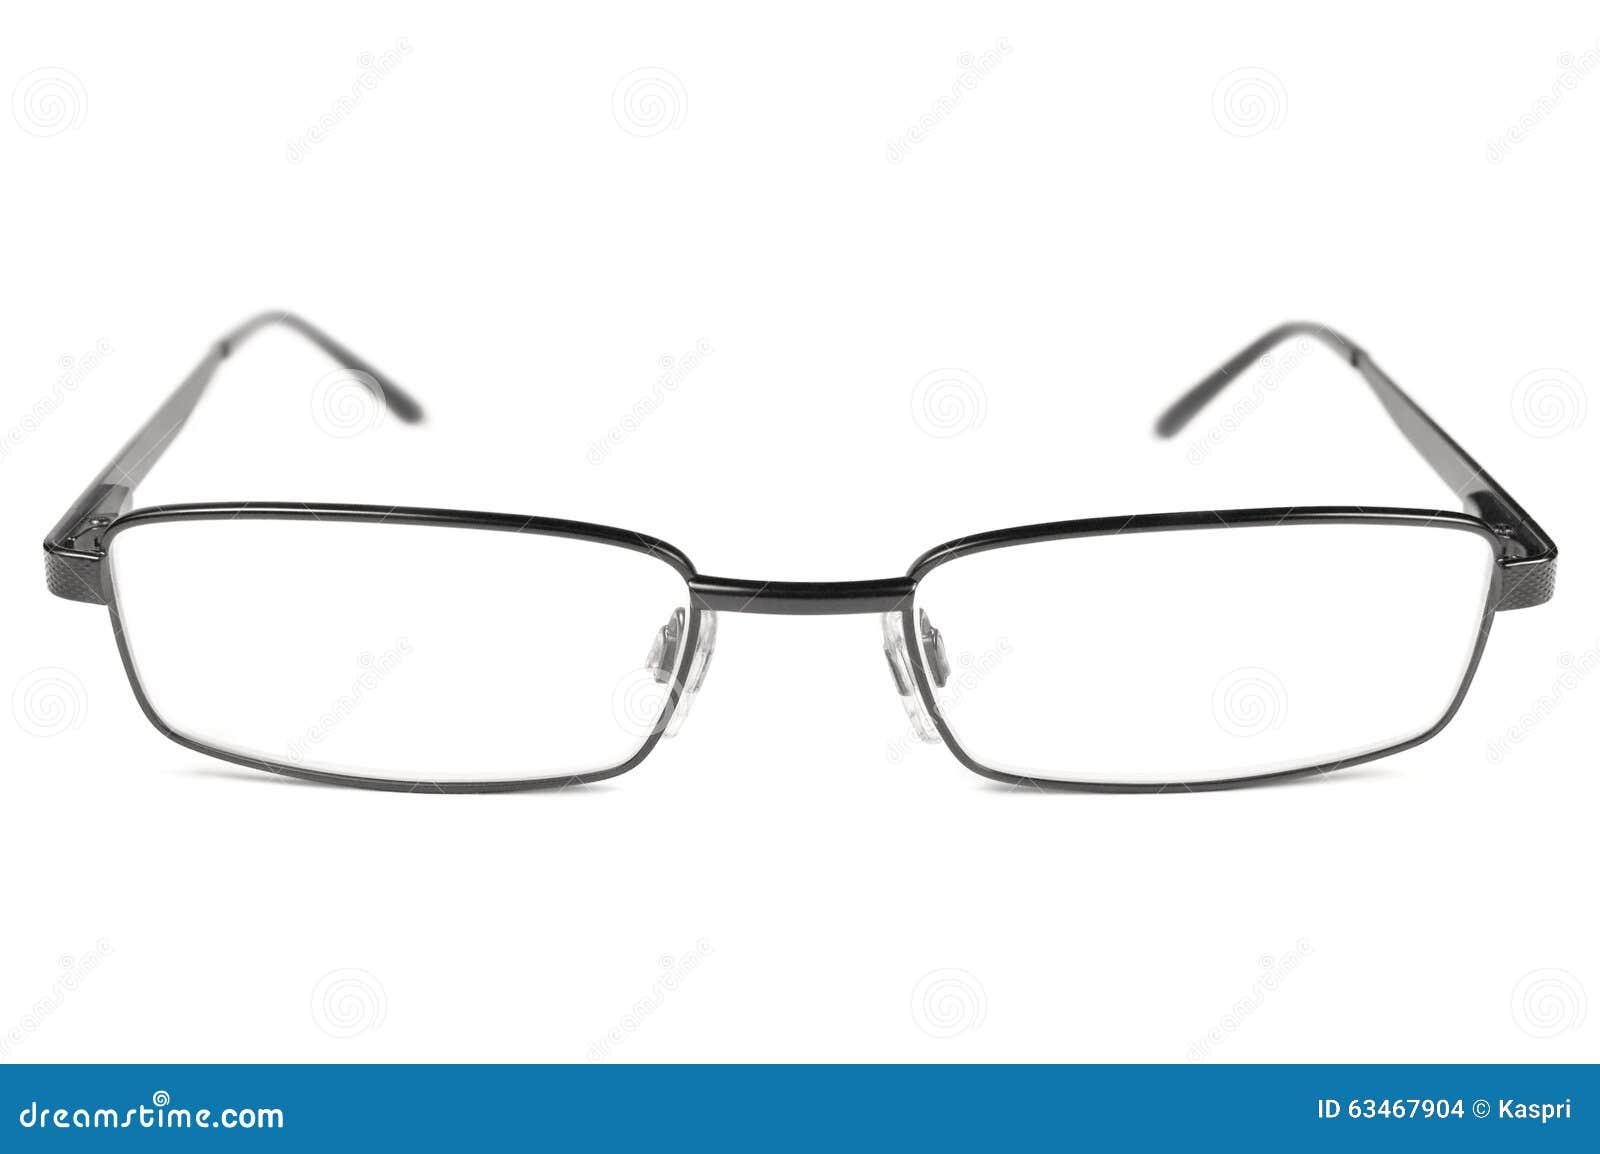 Eyeglass Frame Board Management : Eyeglasses, Black Men Spectacles, Titanium Frame, Isolated ...